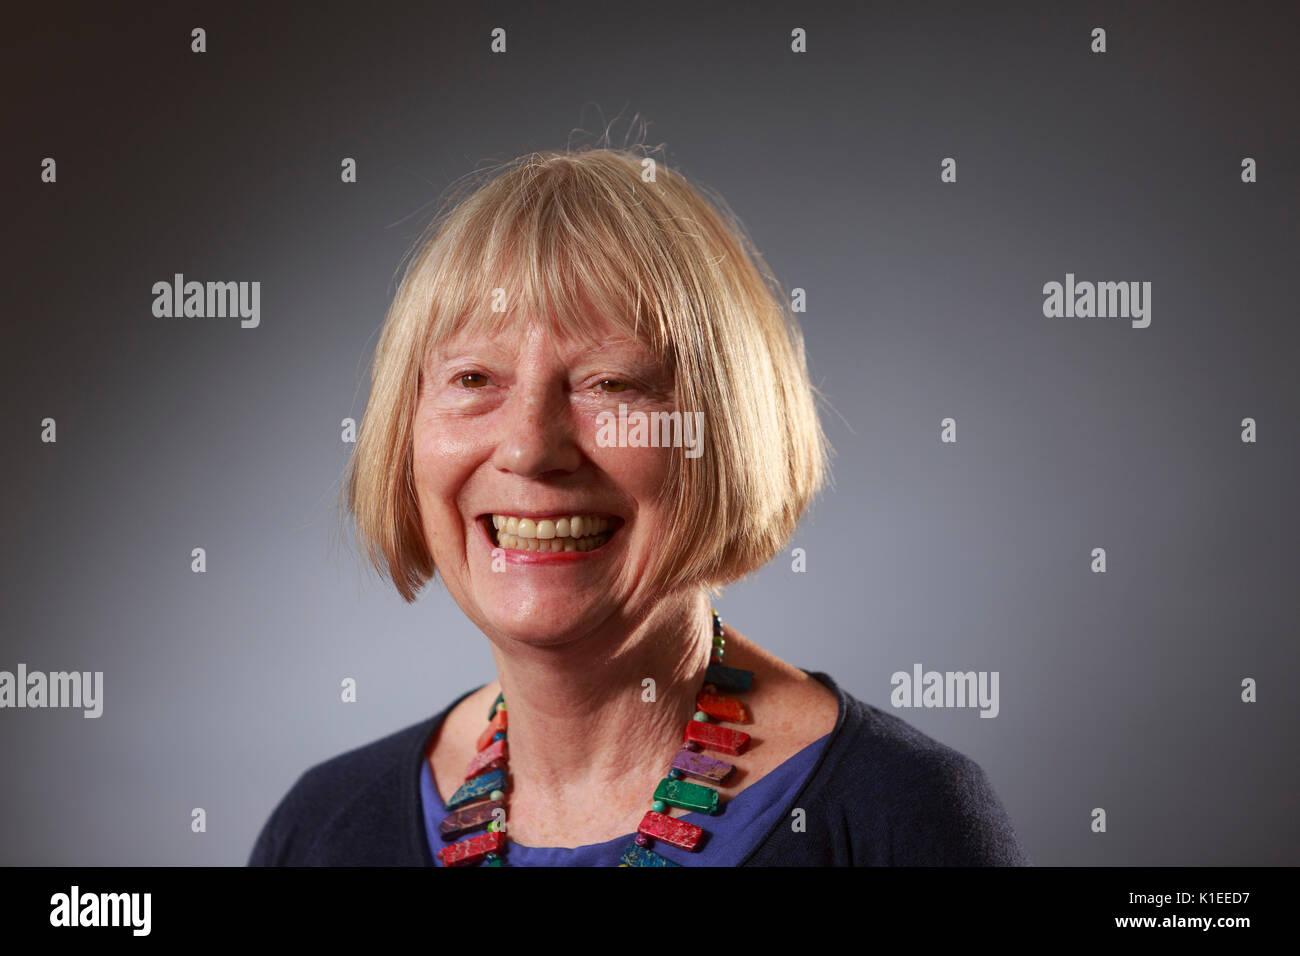 Edinburgh, Scotland, UK. 27th Aug, 2017. Day 16 Edinburgh International Book Festival. Pictured: Sheila Rowbotham, British socialist feminist theorist and writer. Credit: Pako Mera/Alamy Live News - Stock Image